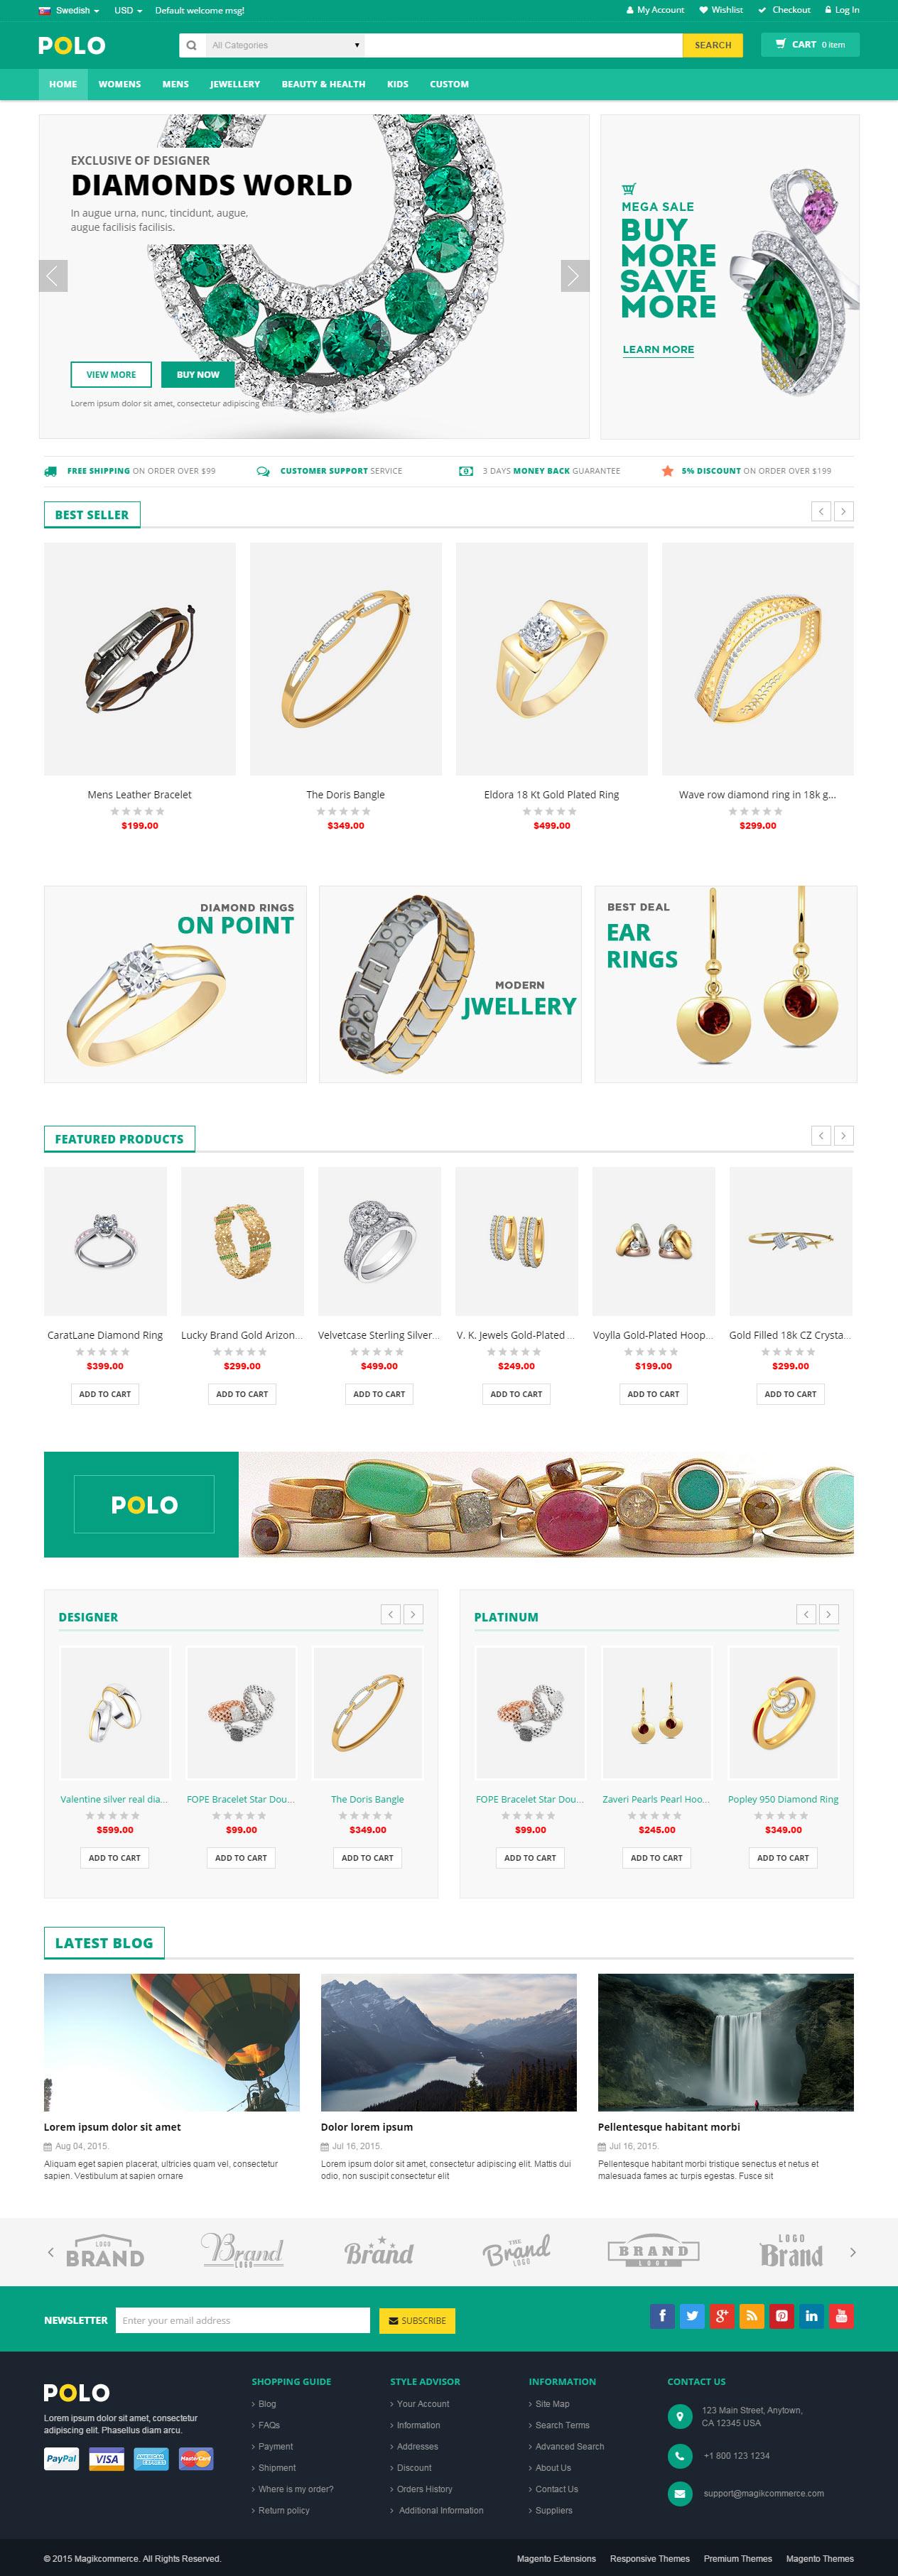 5+ Best Premium Responsive Magento Jewellery Store Themes in 2015 ...